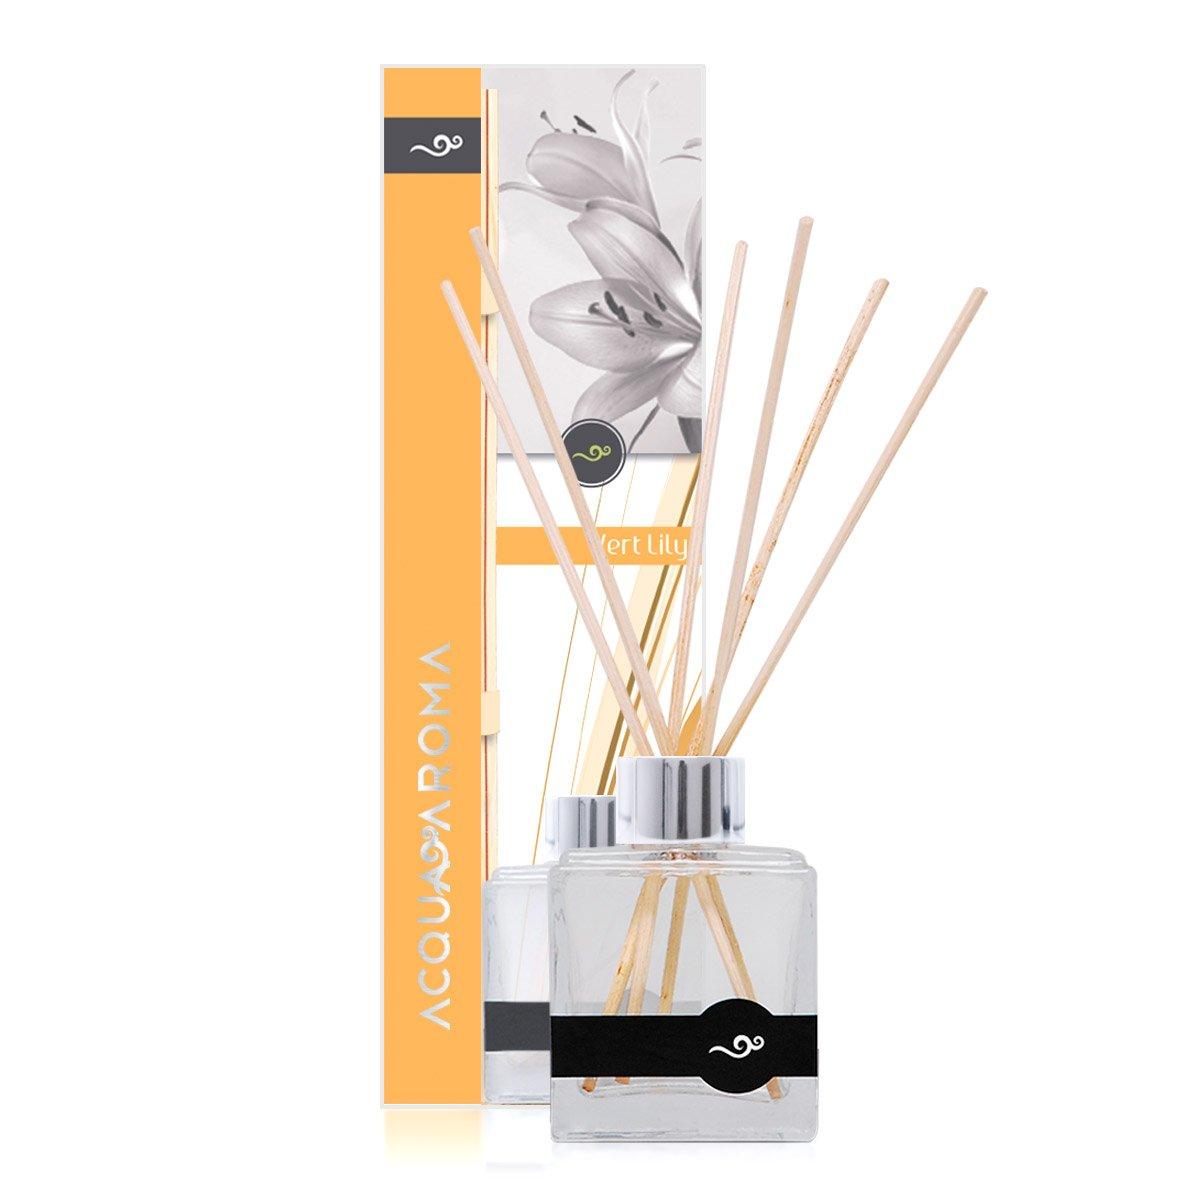 Acqua Aroma Vert Lily Reed Diffuser 3.4 FL OZ (100ml)